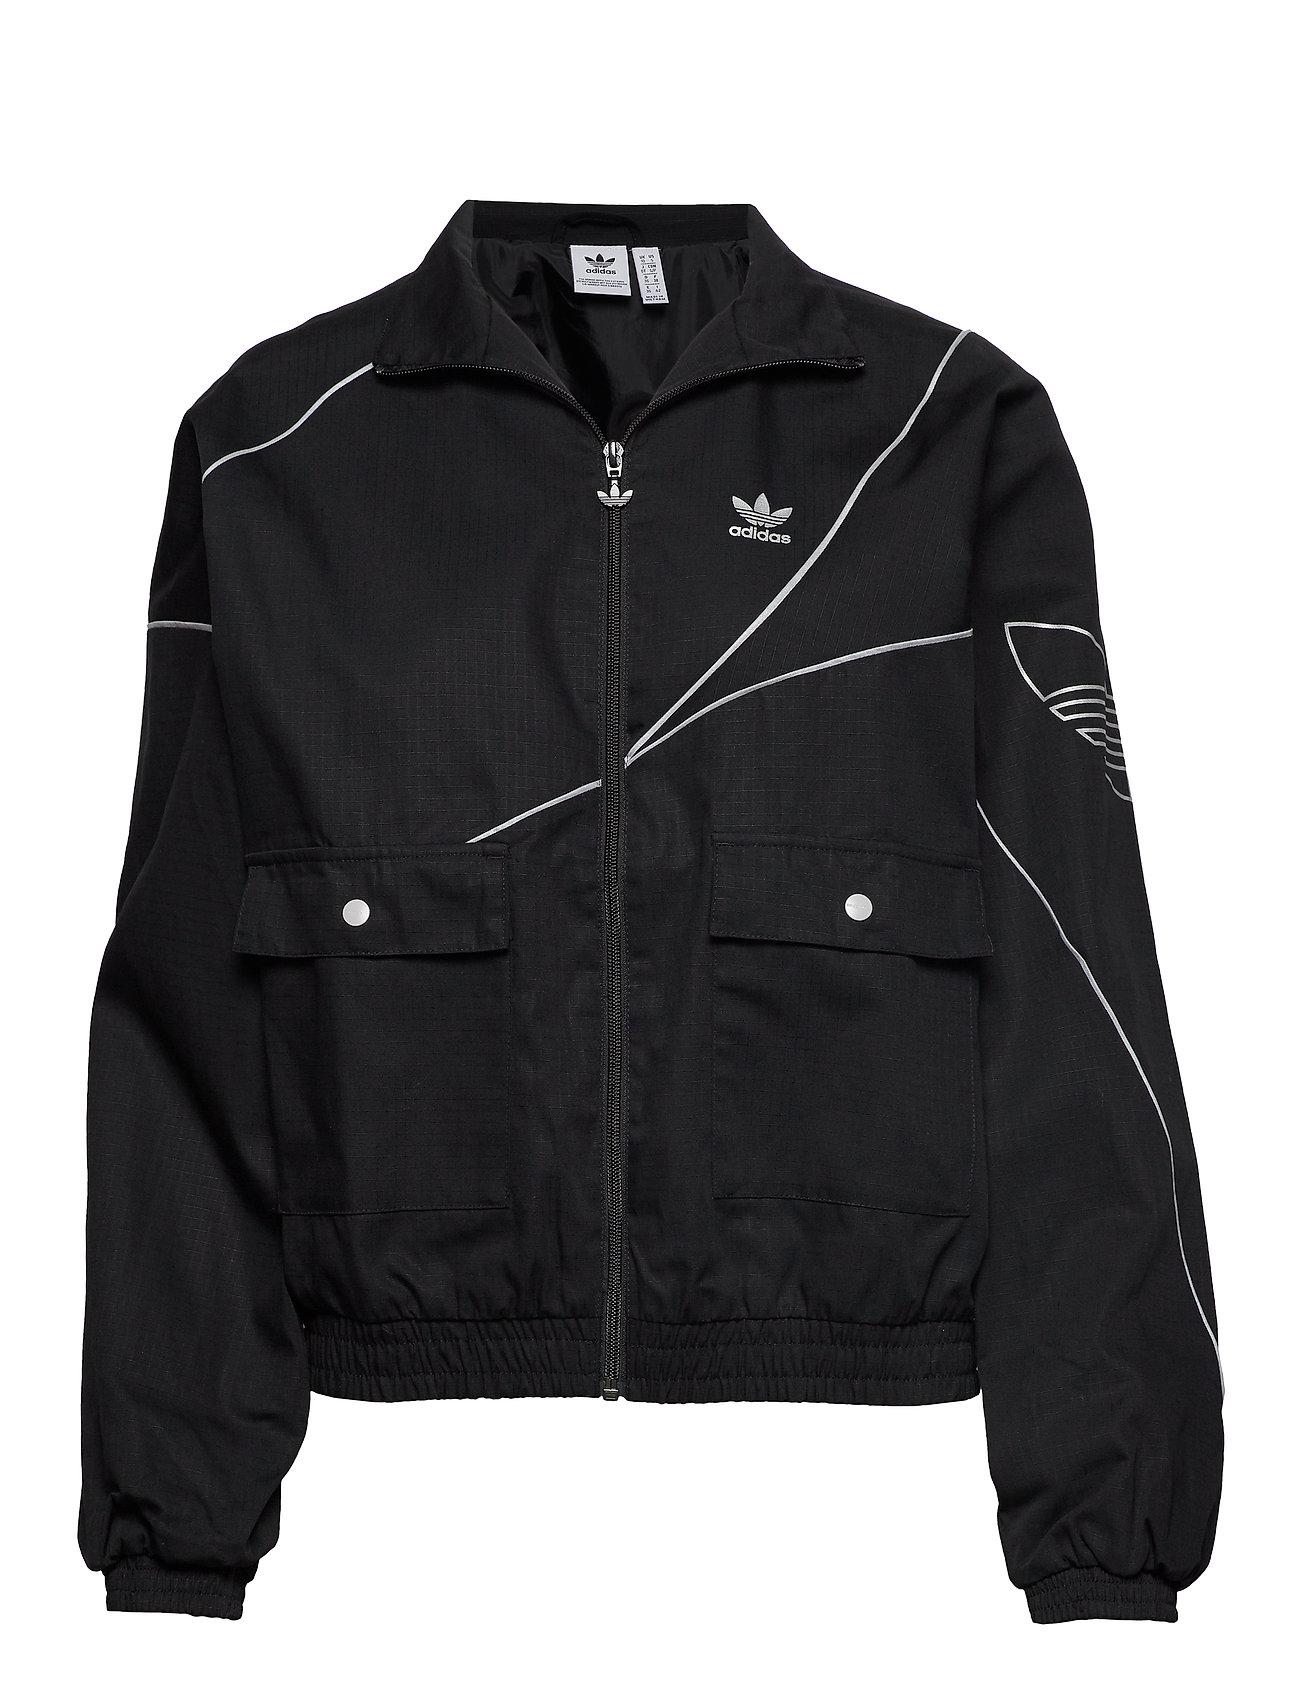 adidas Originals TRACK TOP - BLACK